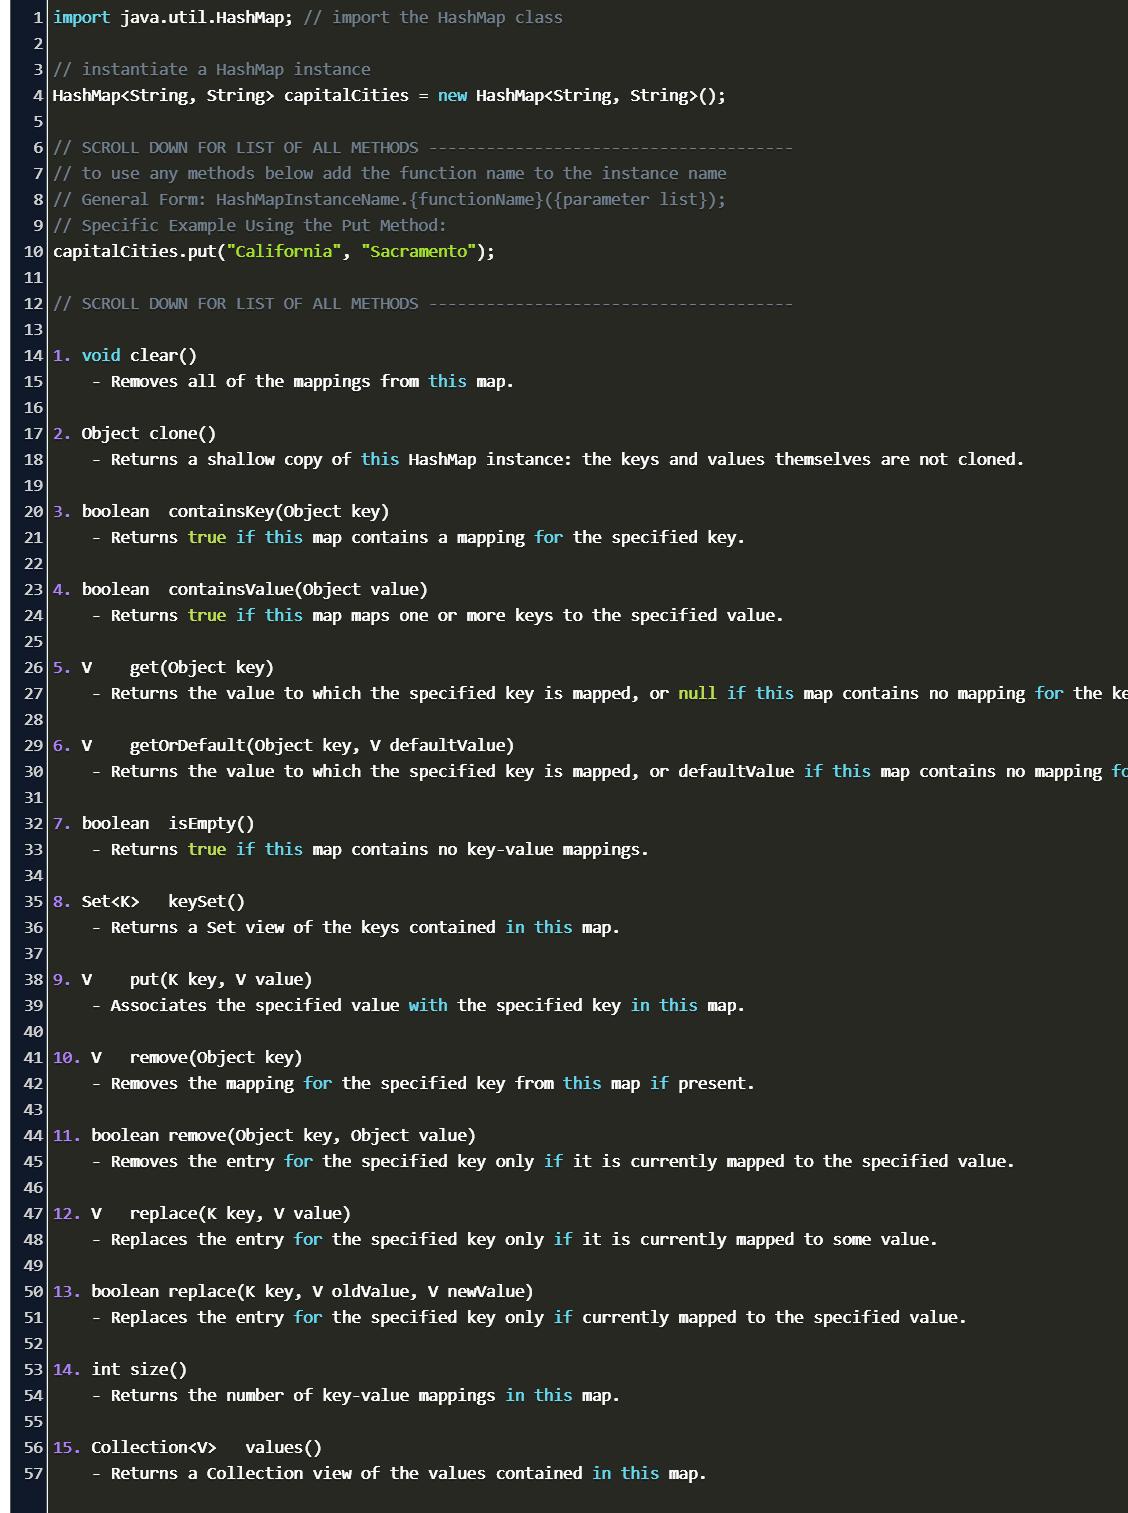 hashmap in java Code Example